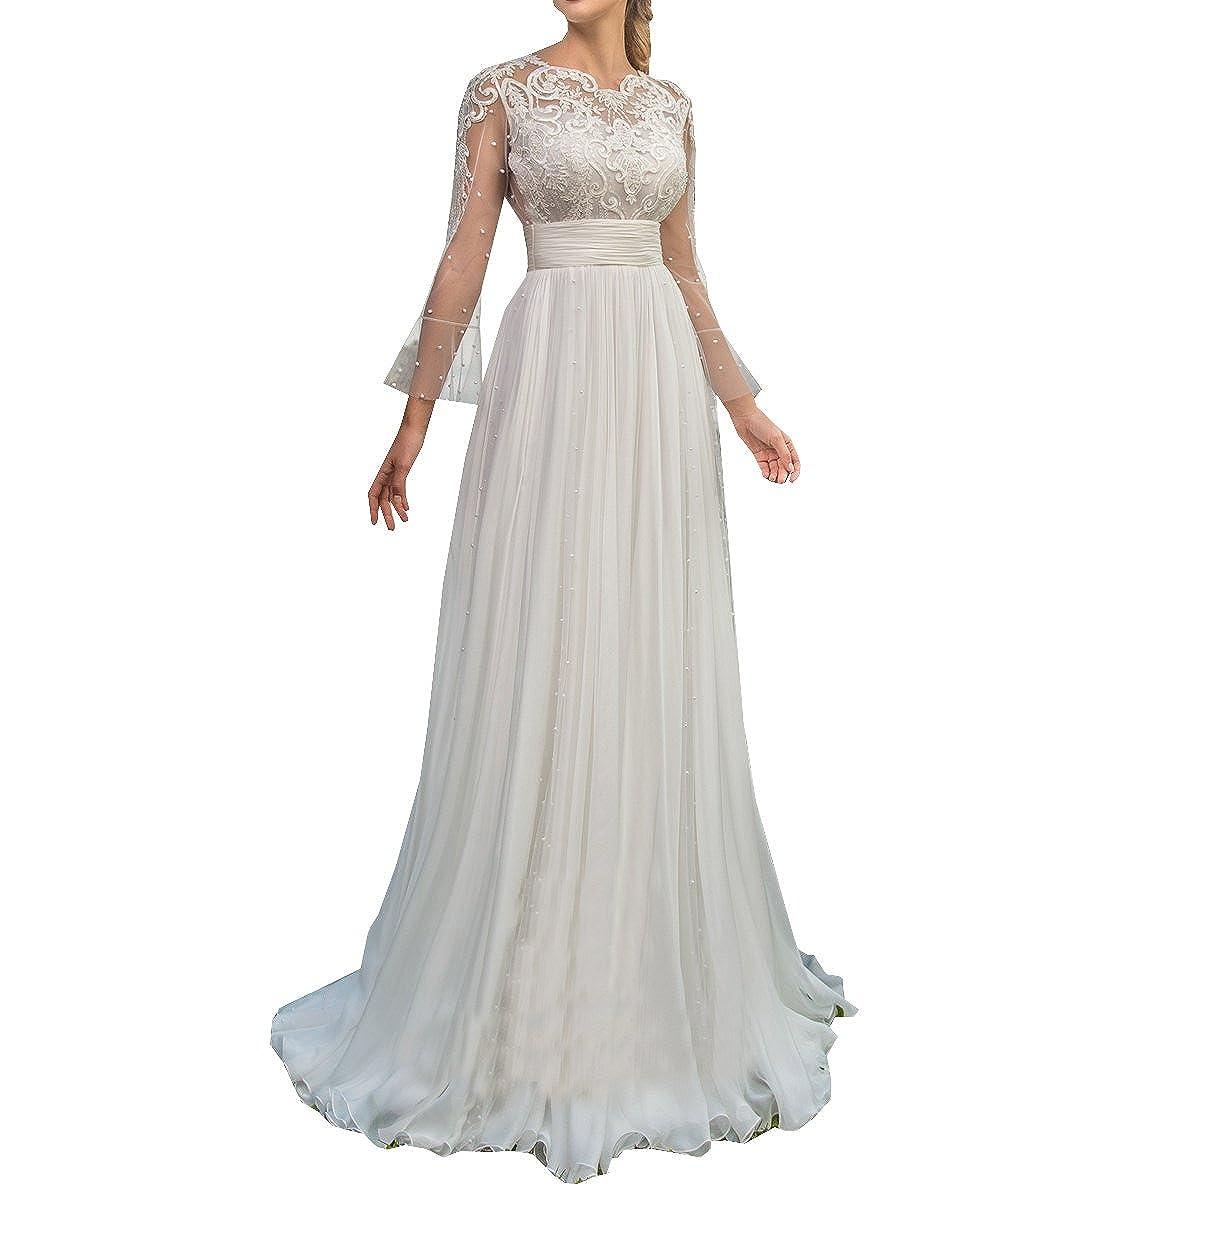 5242f779f7311 Chiffon Lace Beach Wedding Dress 2018 Simple Long Sleeves Hollow ...